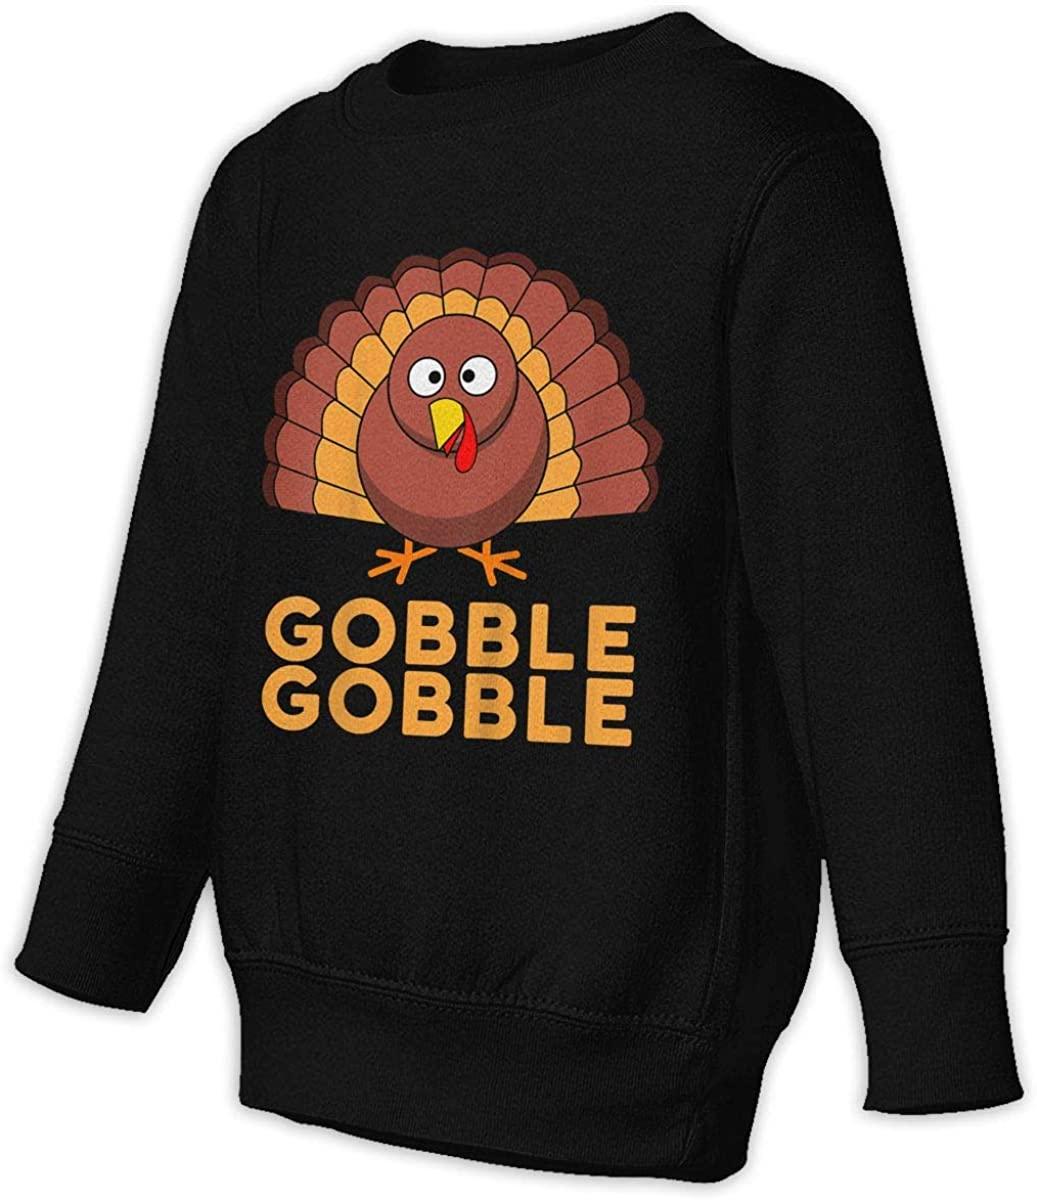 Manbeak Gobble Gobble Unisex Sweatshirt Youth Boy and Girls Pullover Sweatshirt Black